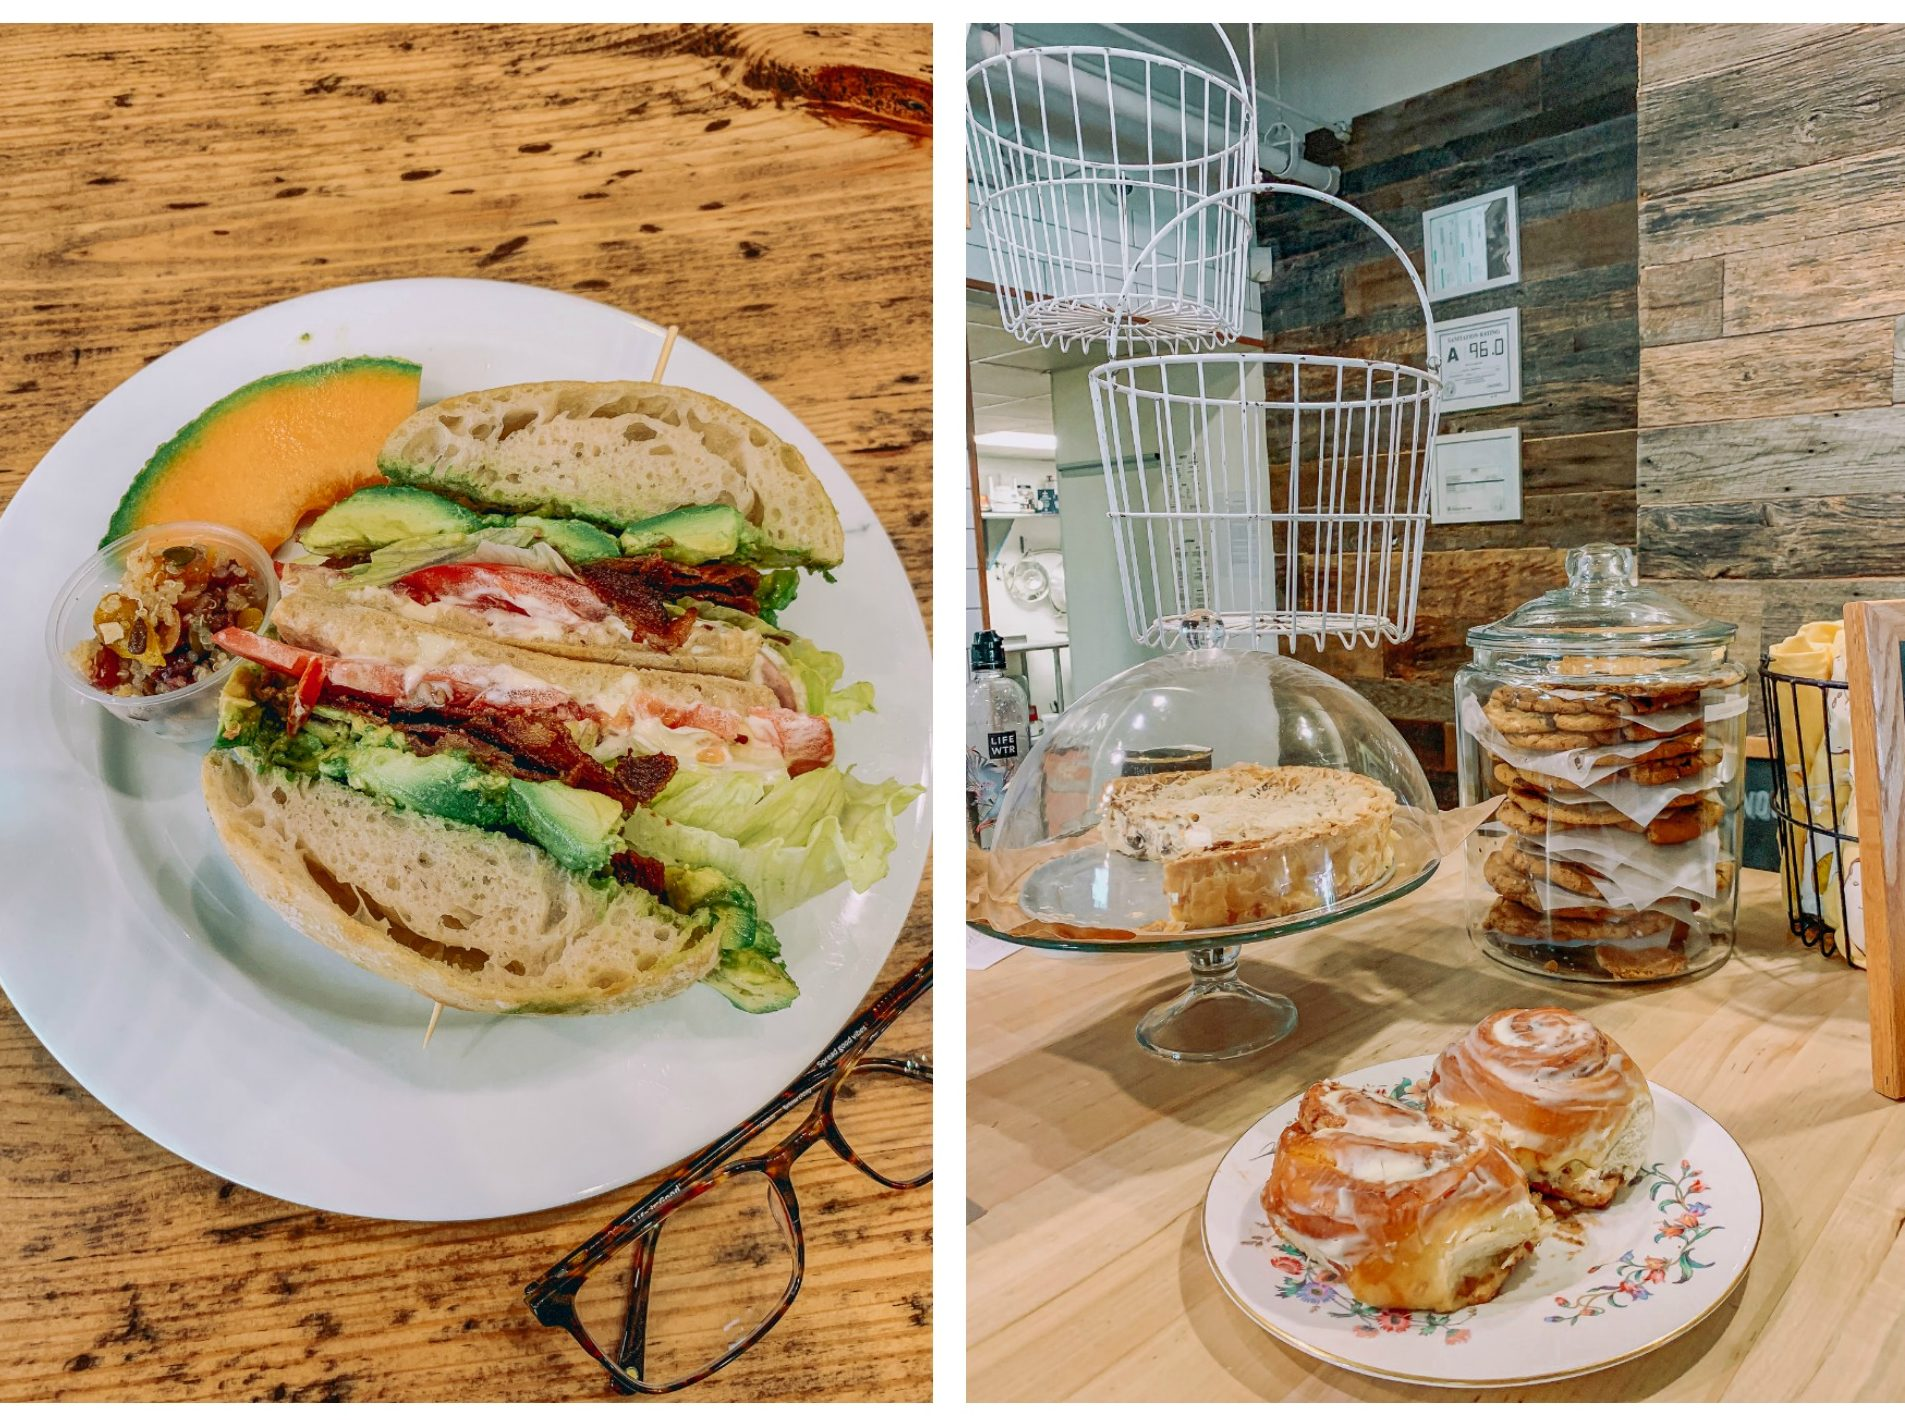 Charlotte nc, coffee shop, breakfast, brunch, Lincoln haberdashery, blt desserts, coffee, oat milk